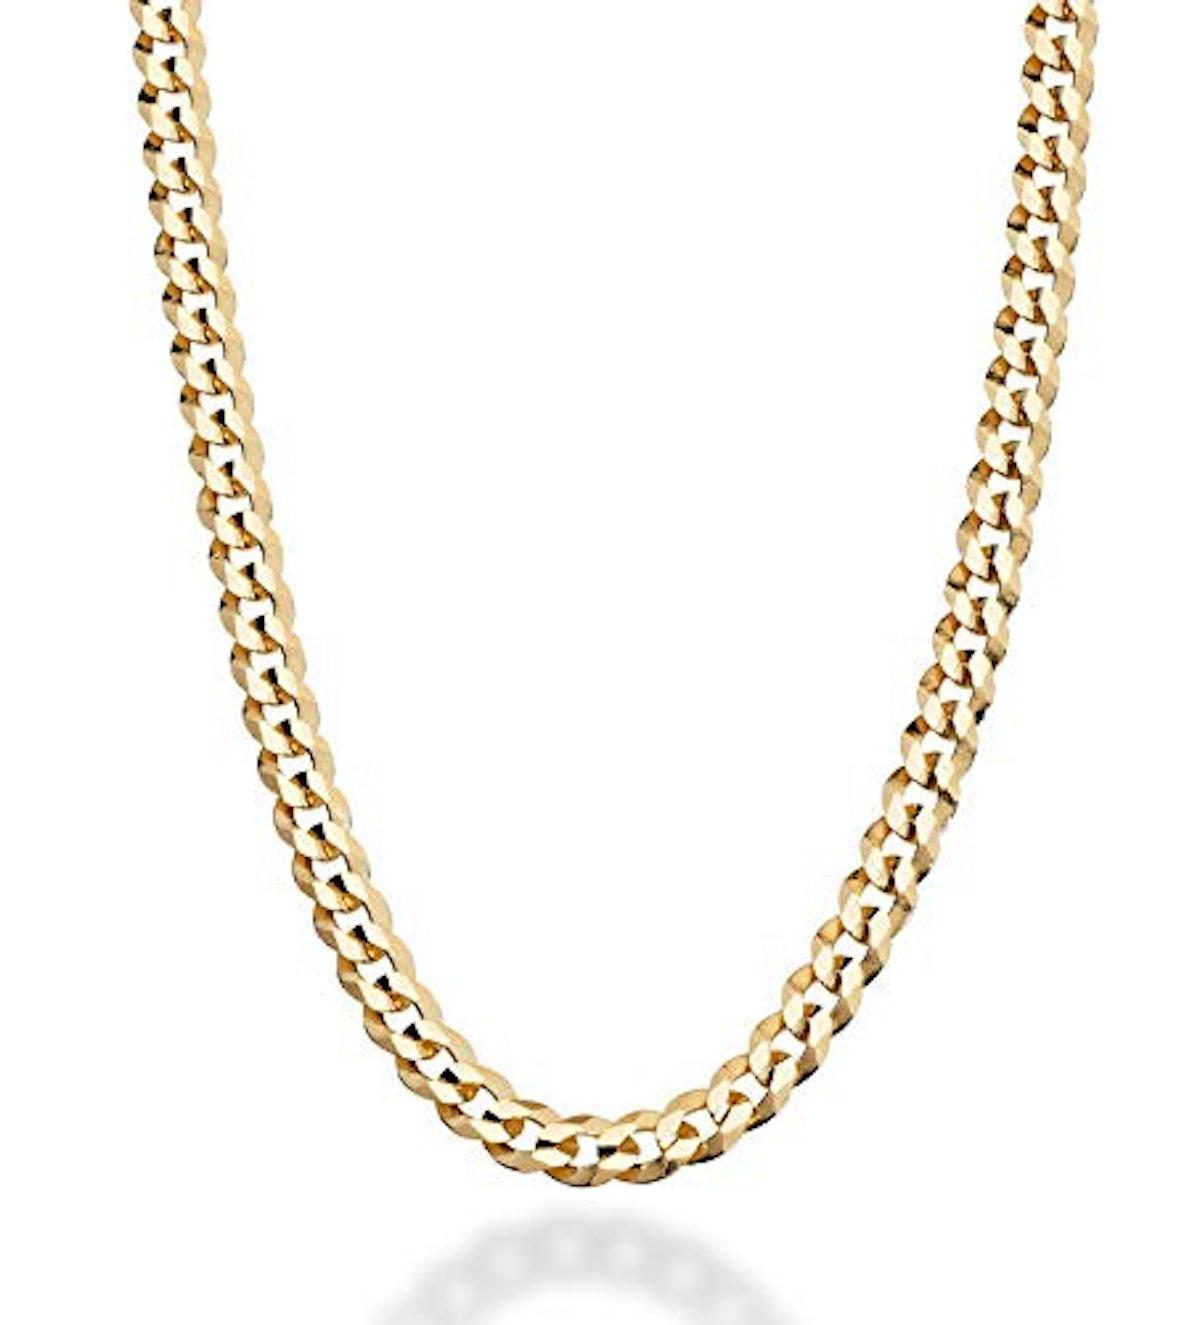 MiaBella Diamond-Cut Cuban Link Curb Chain Necklace